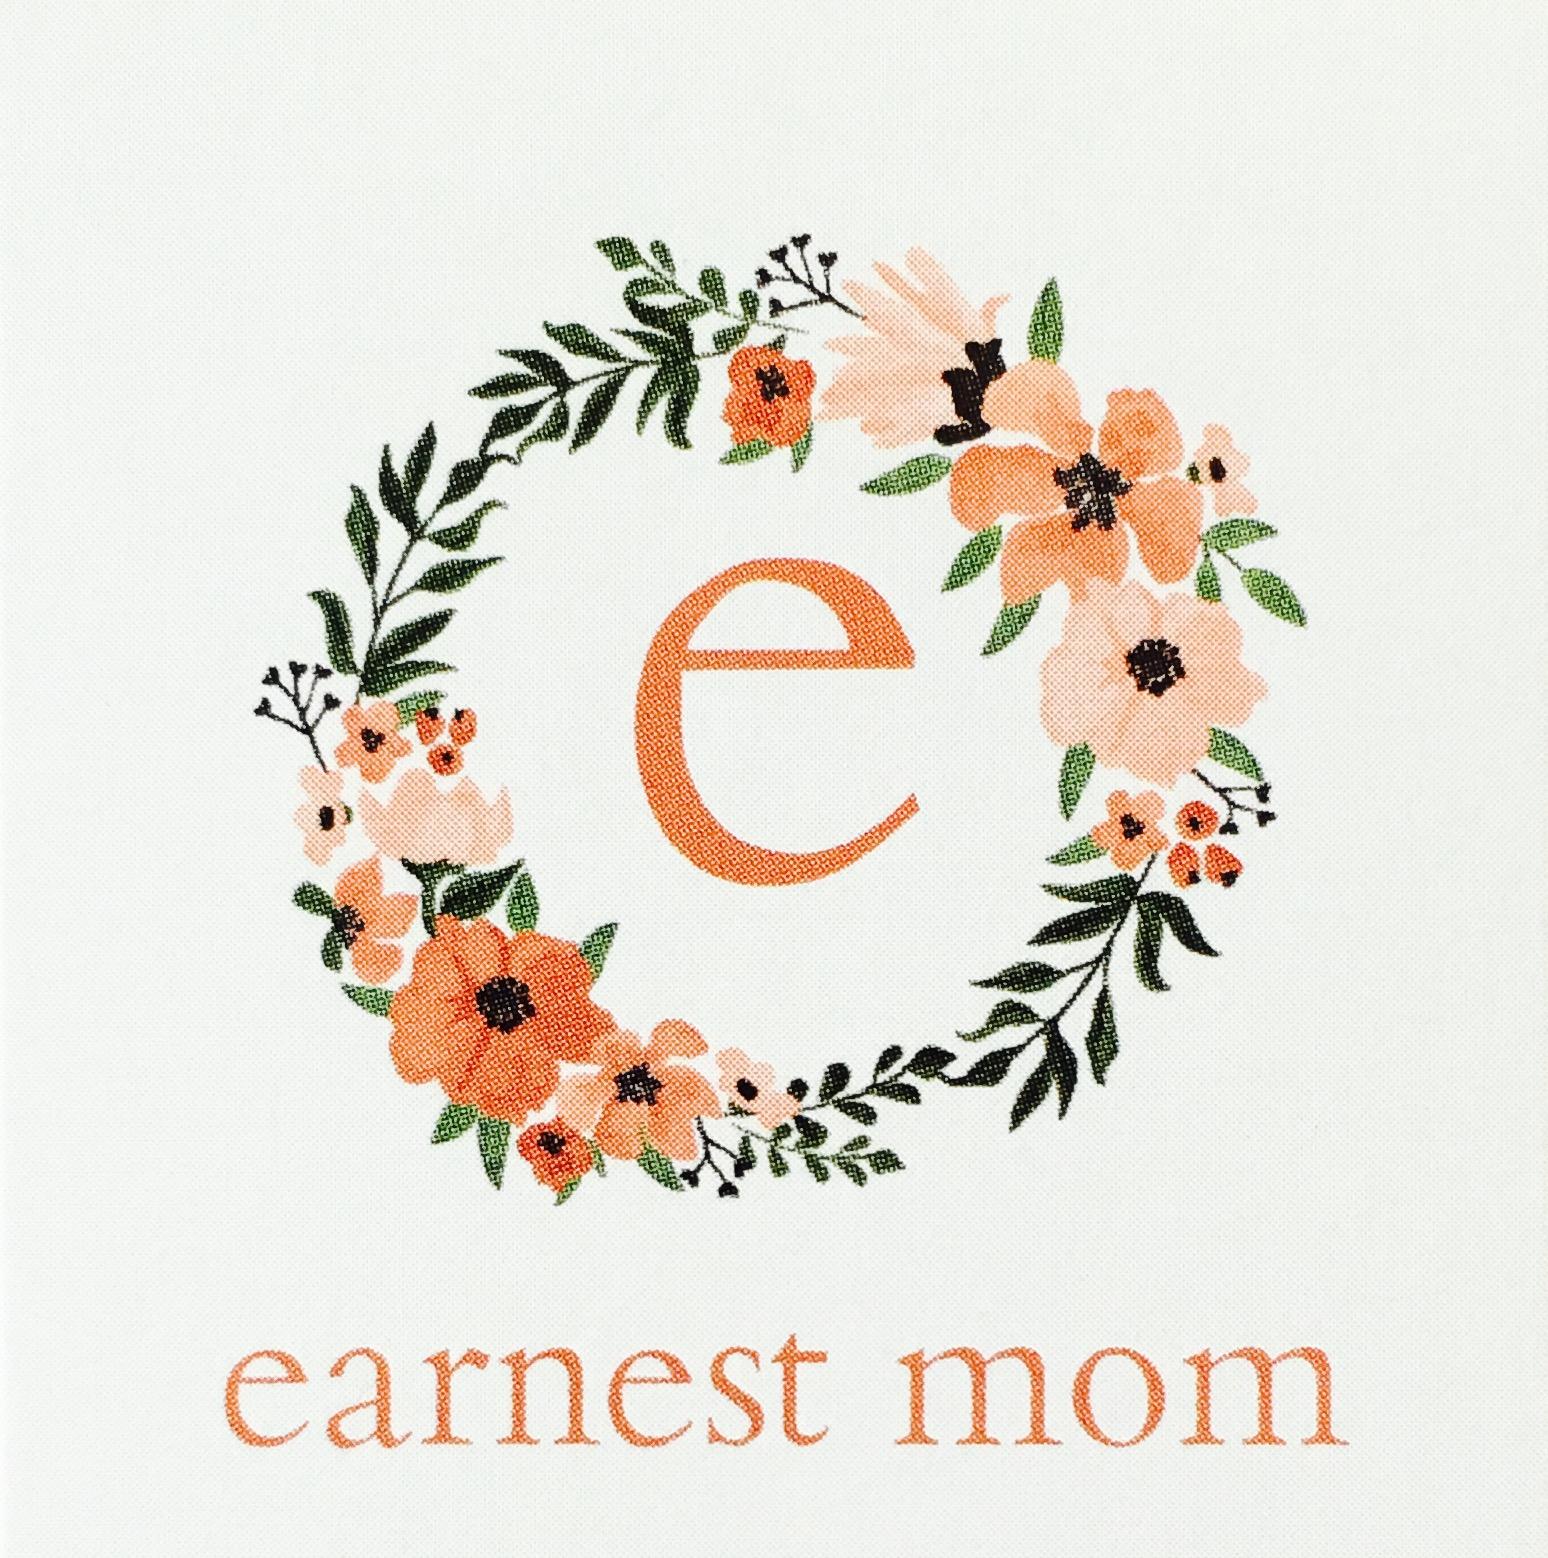 earnest mom